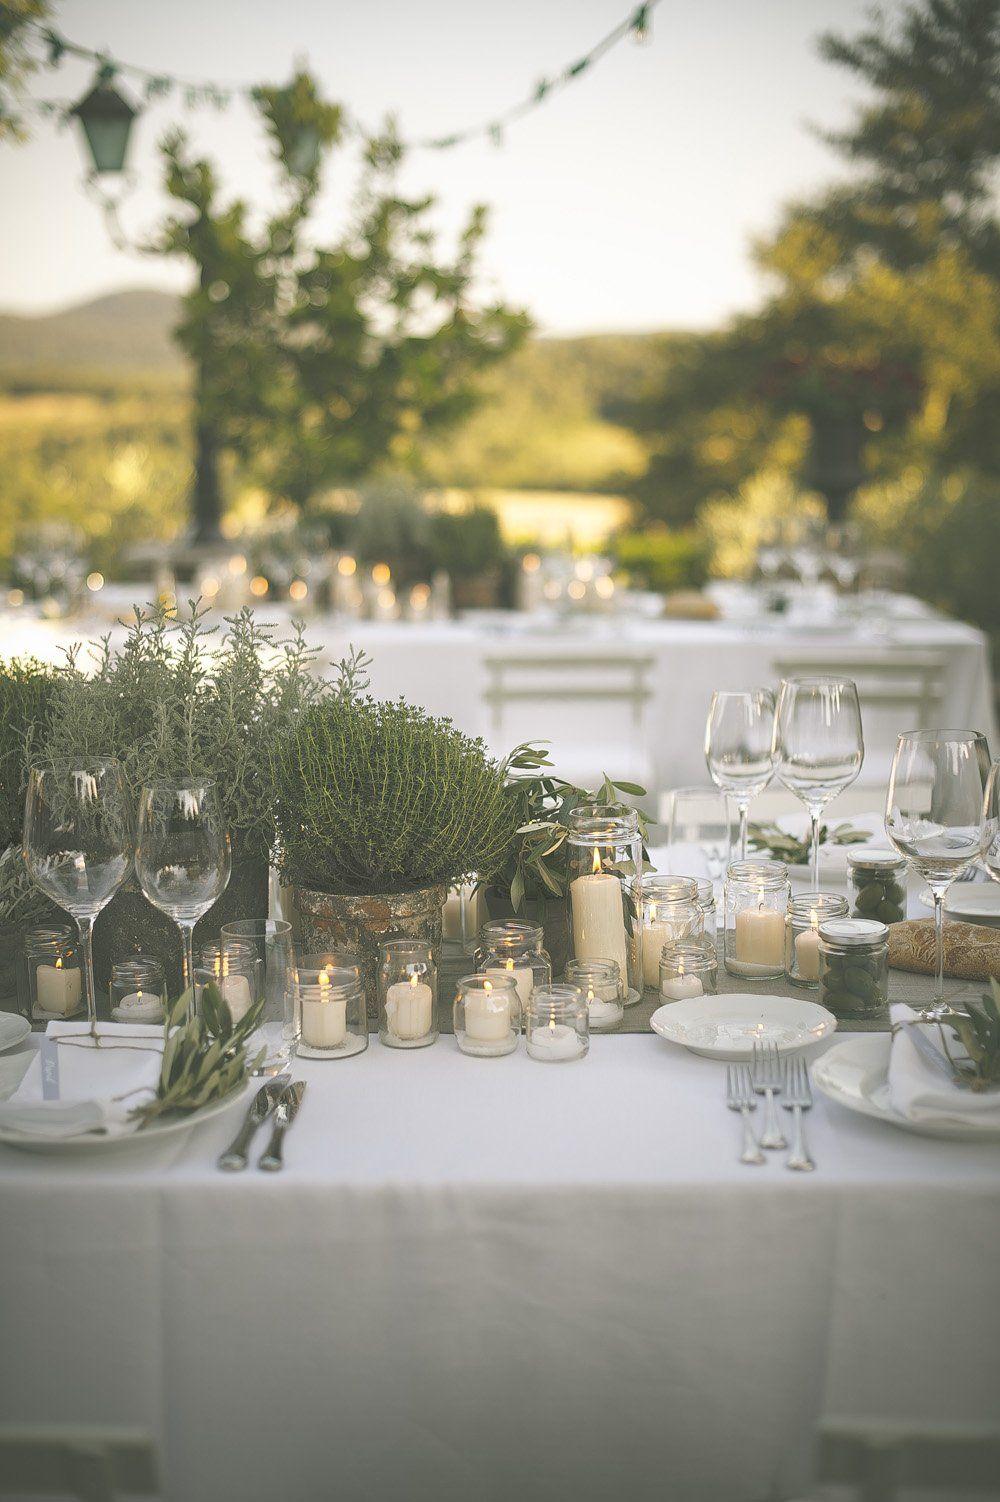 The Perfect Romantic Italian Garden Dinner Party